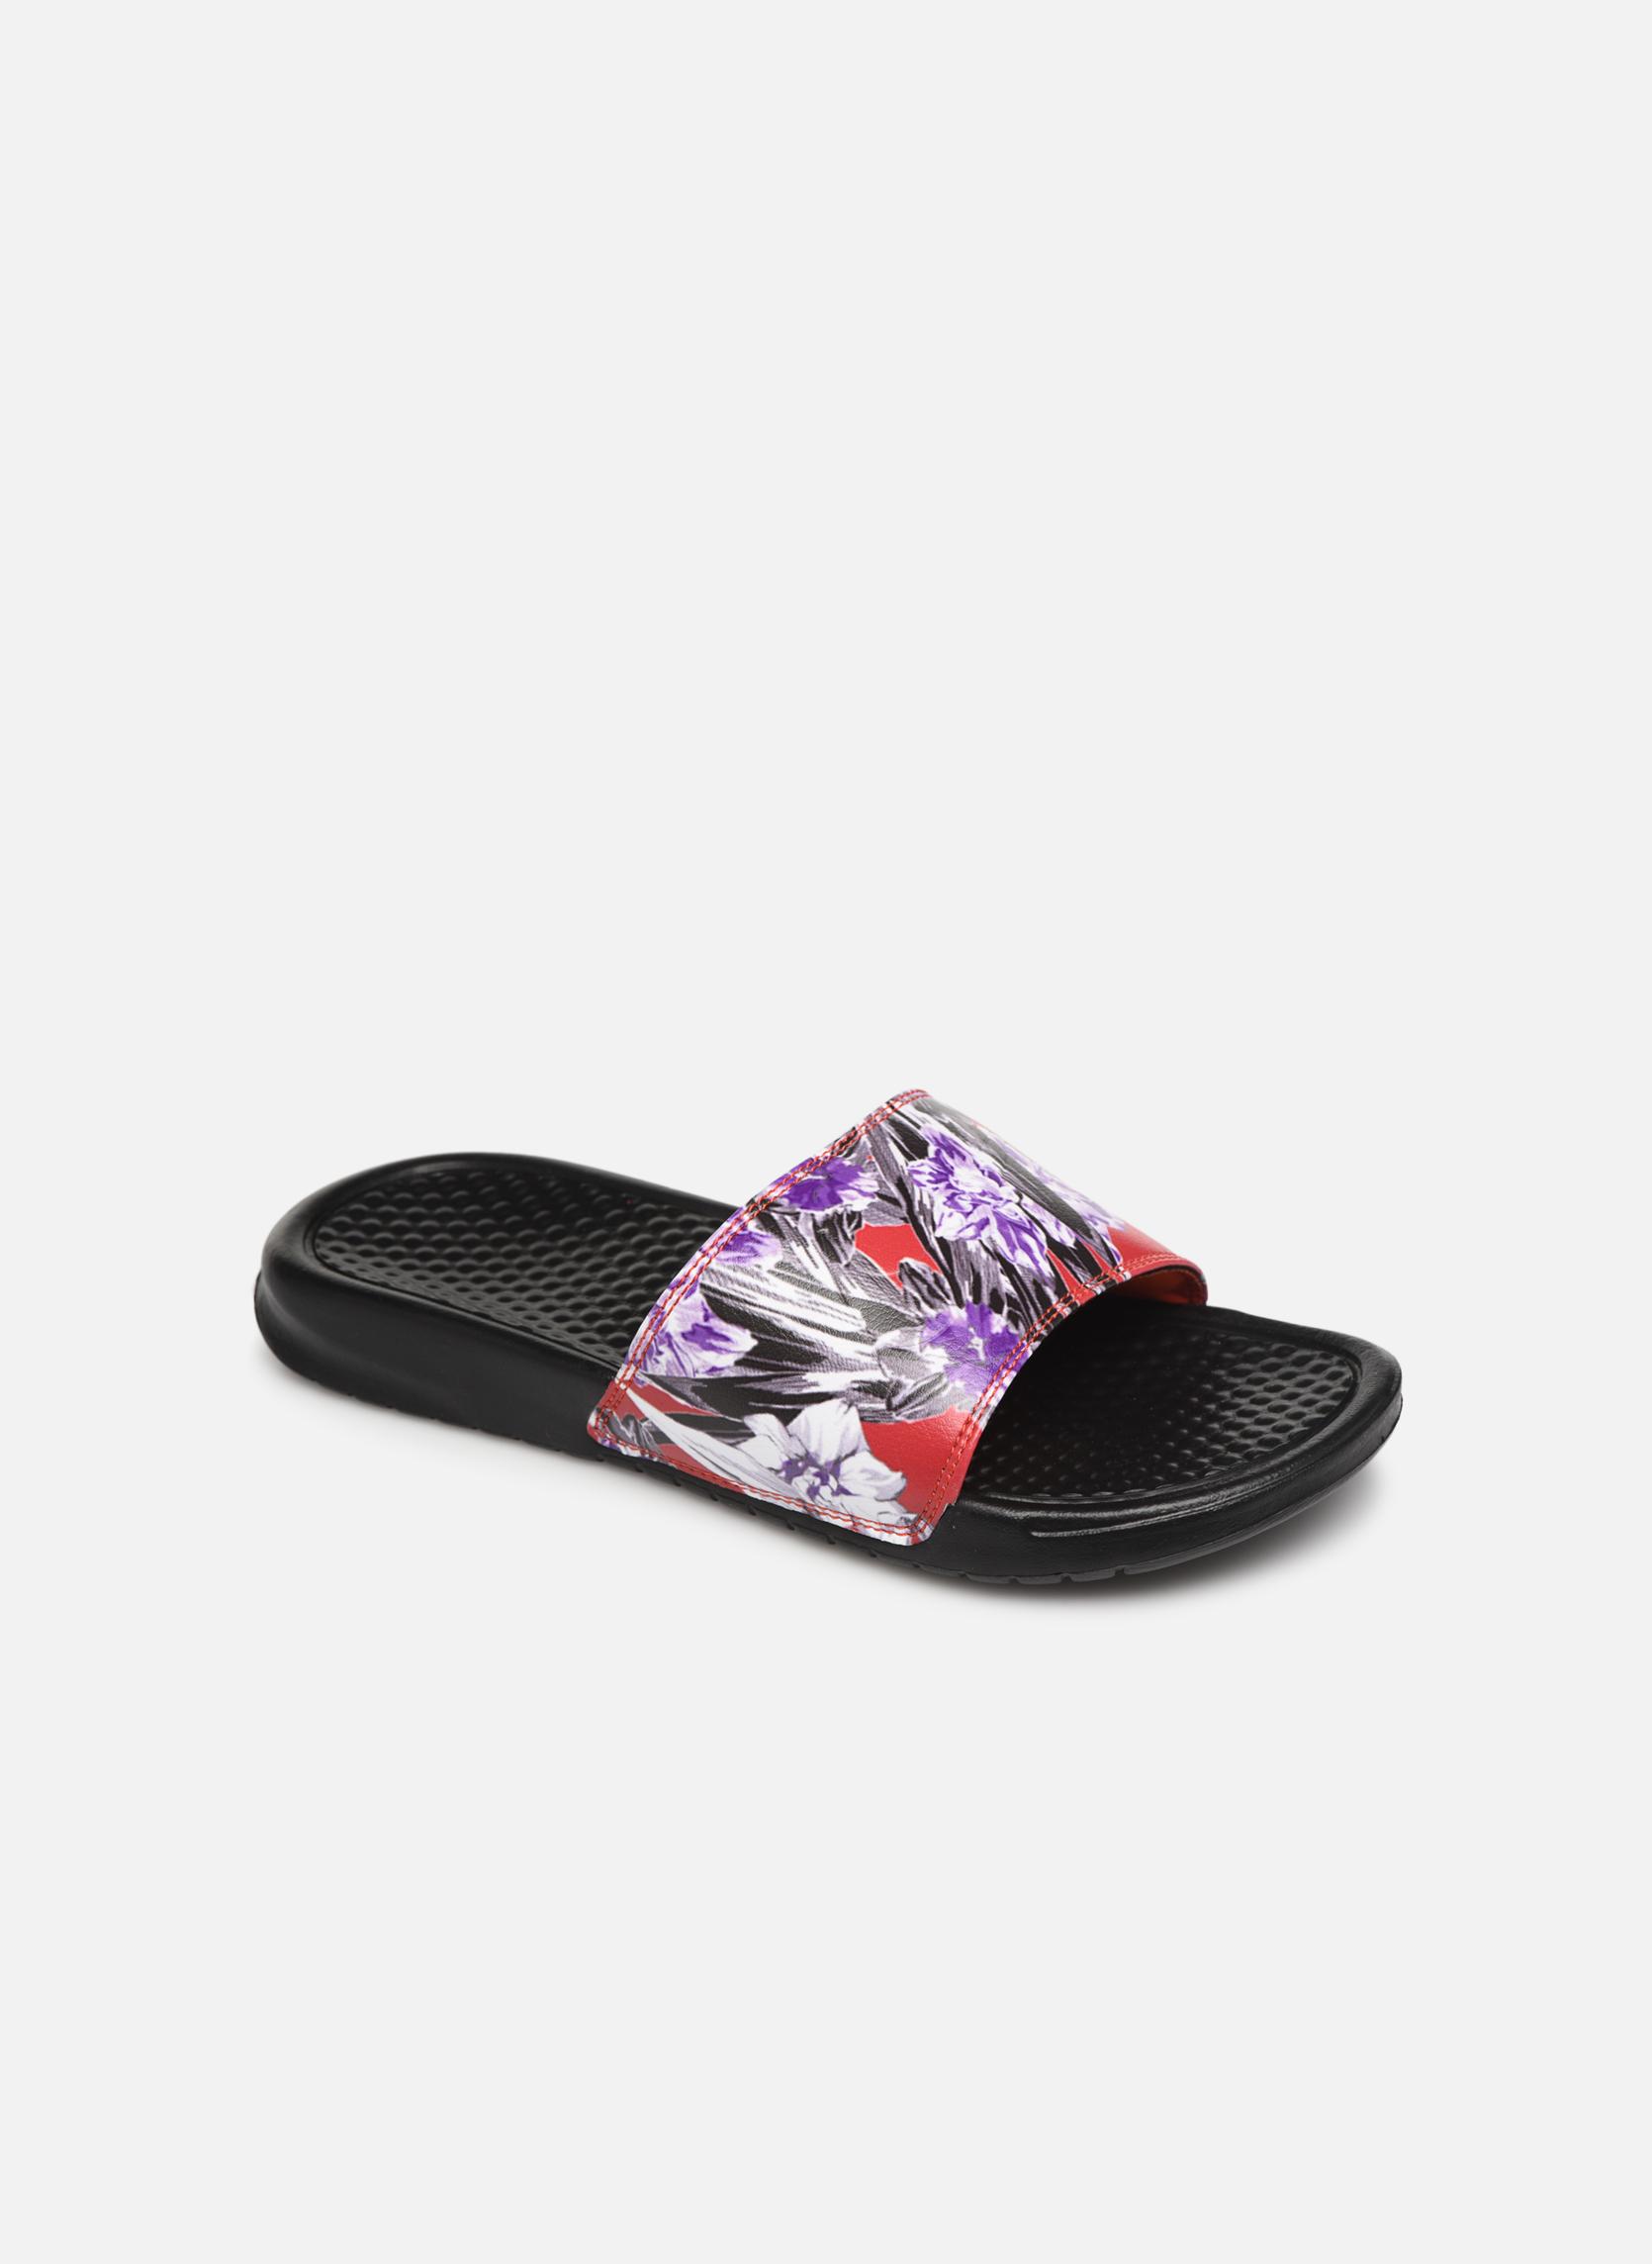 Chaussures À Des Trouver Où Nike Bayonne 9IEH2WYD